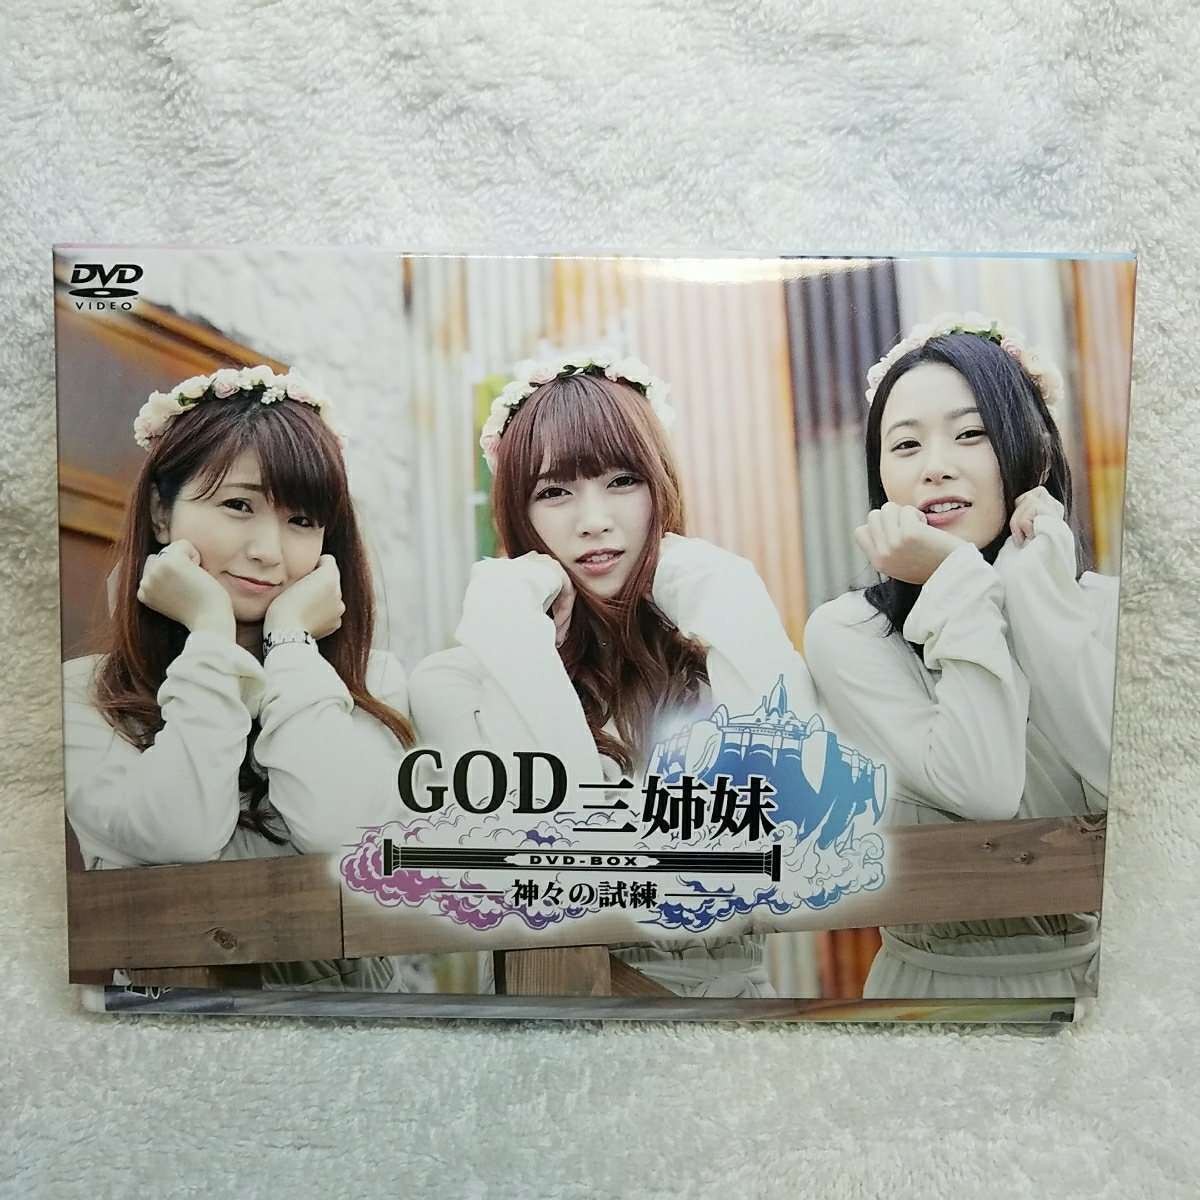 GOD三姉妹 DVD-BOX 送料無料!